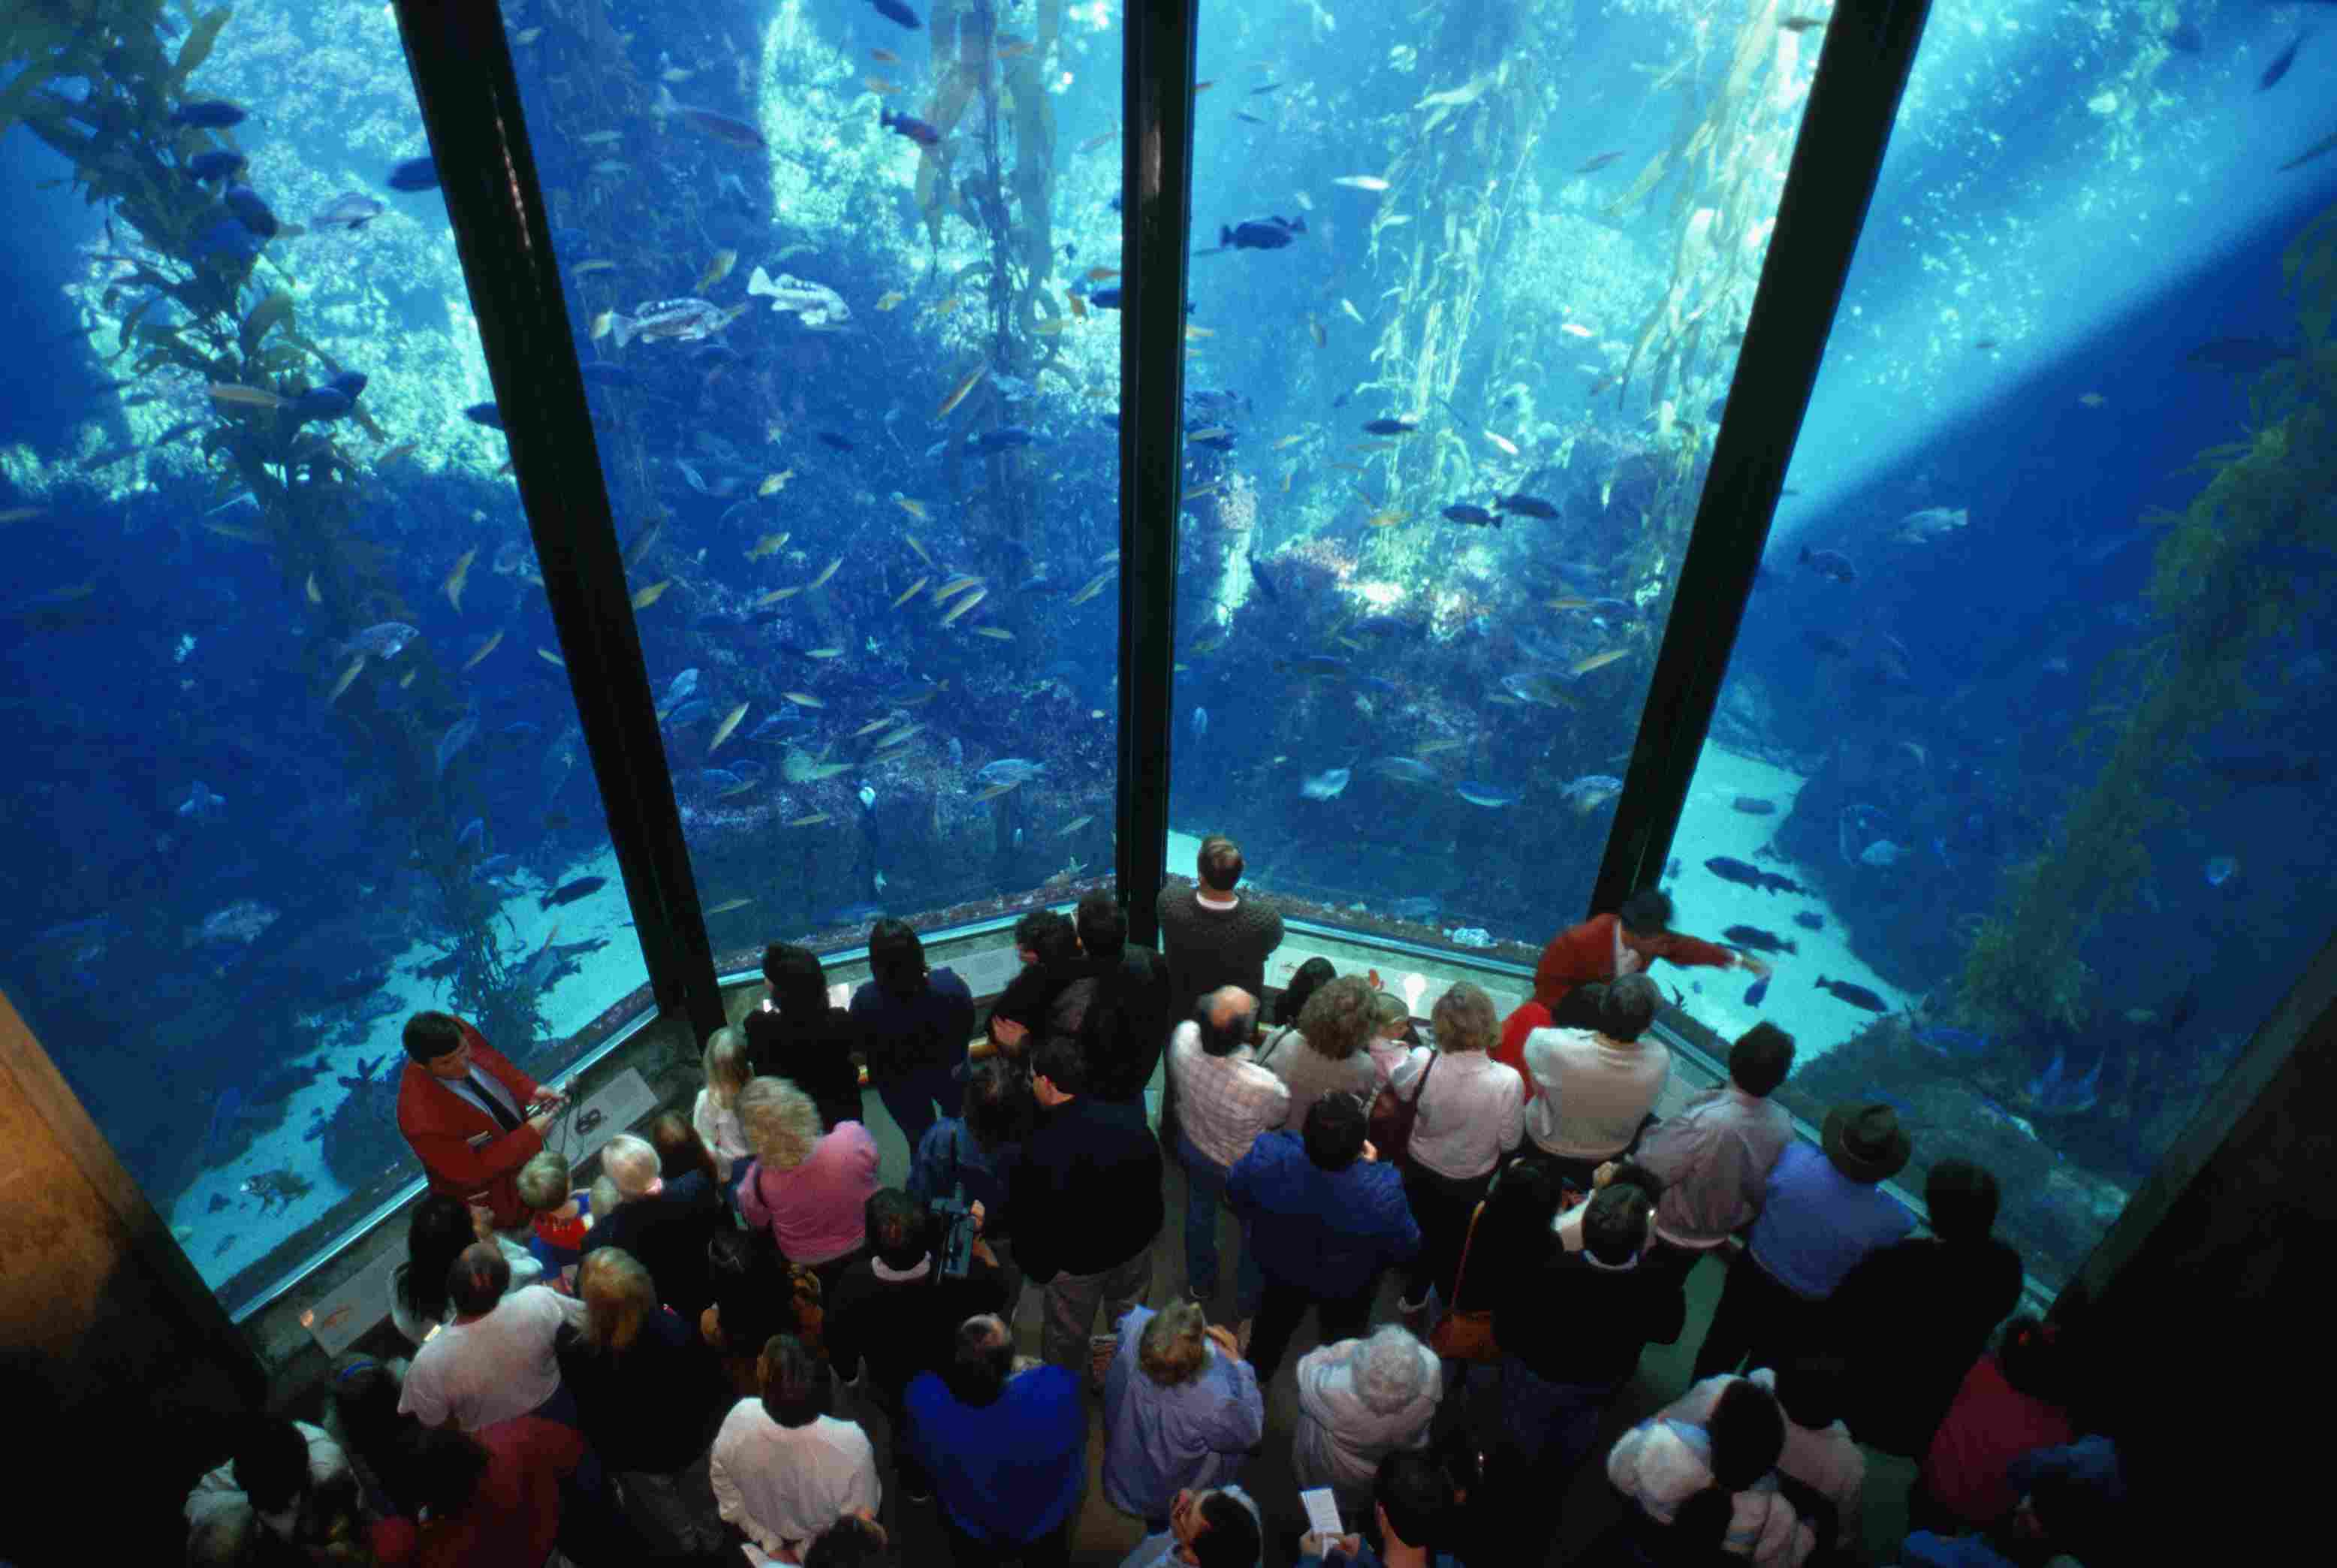 Visitors at the Monterey Bay Aquarium